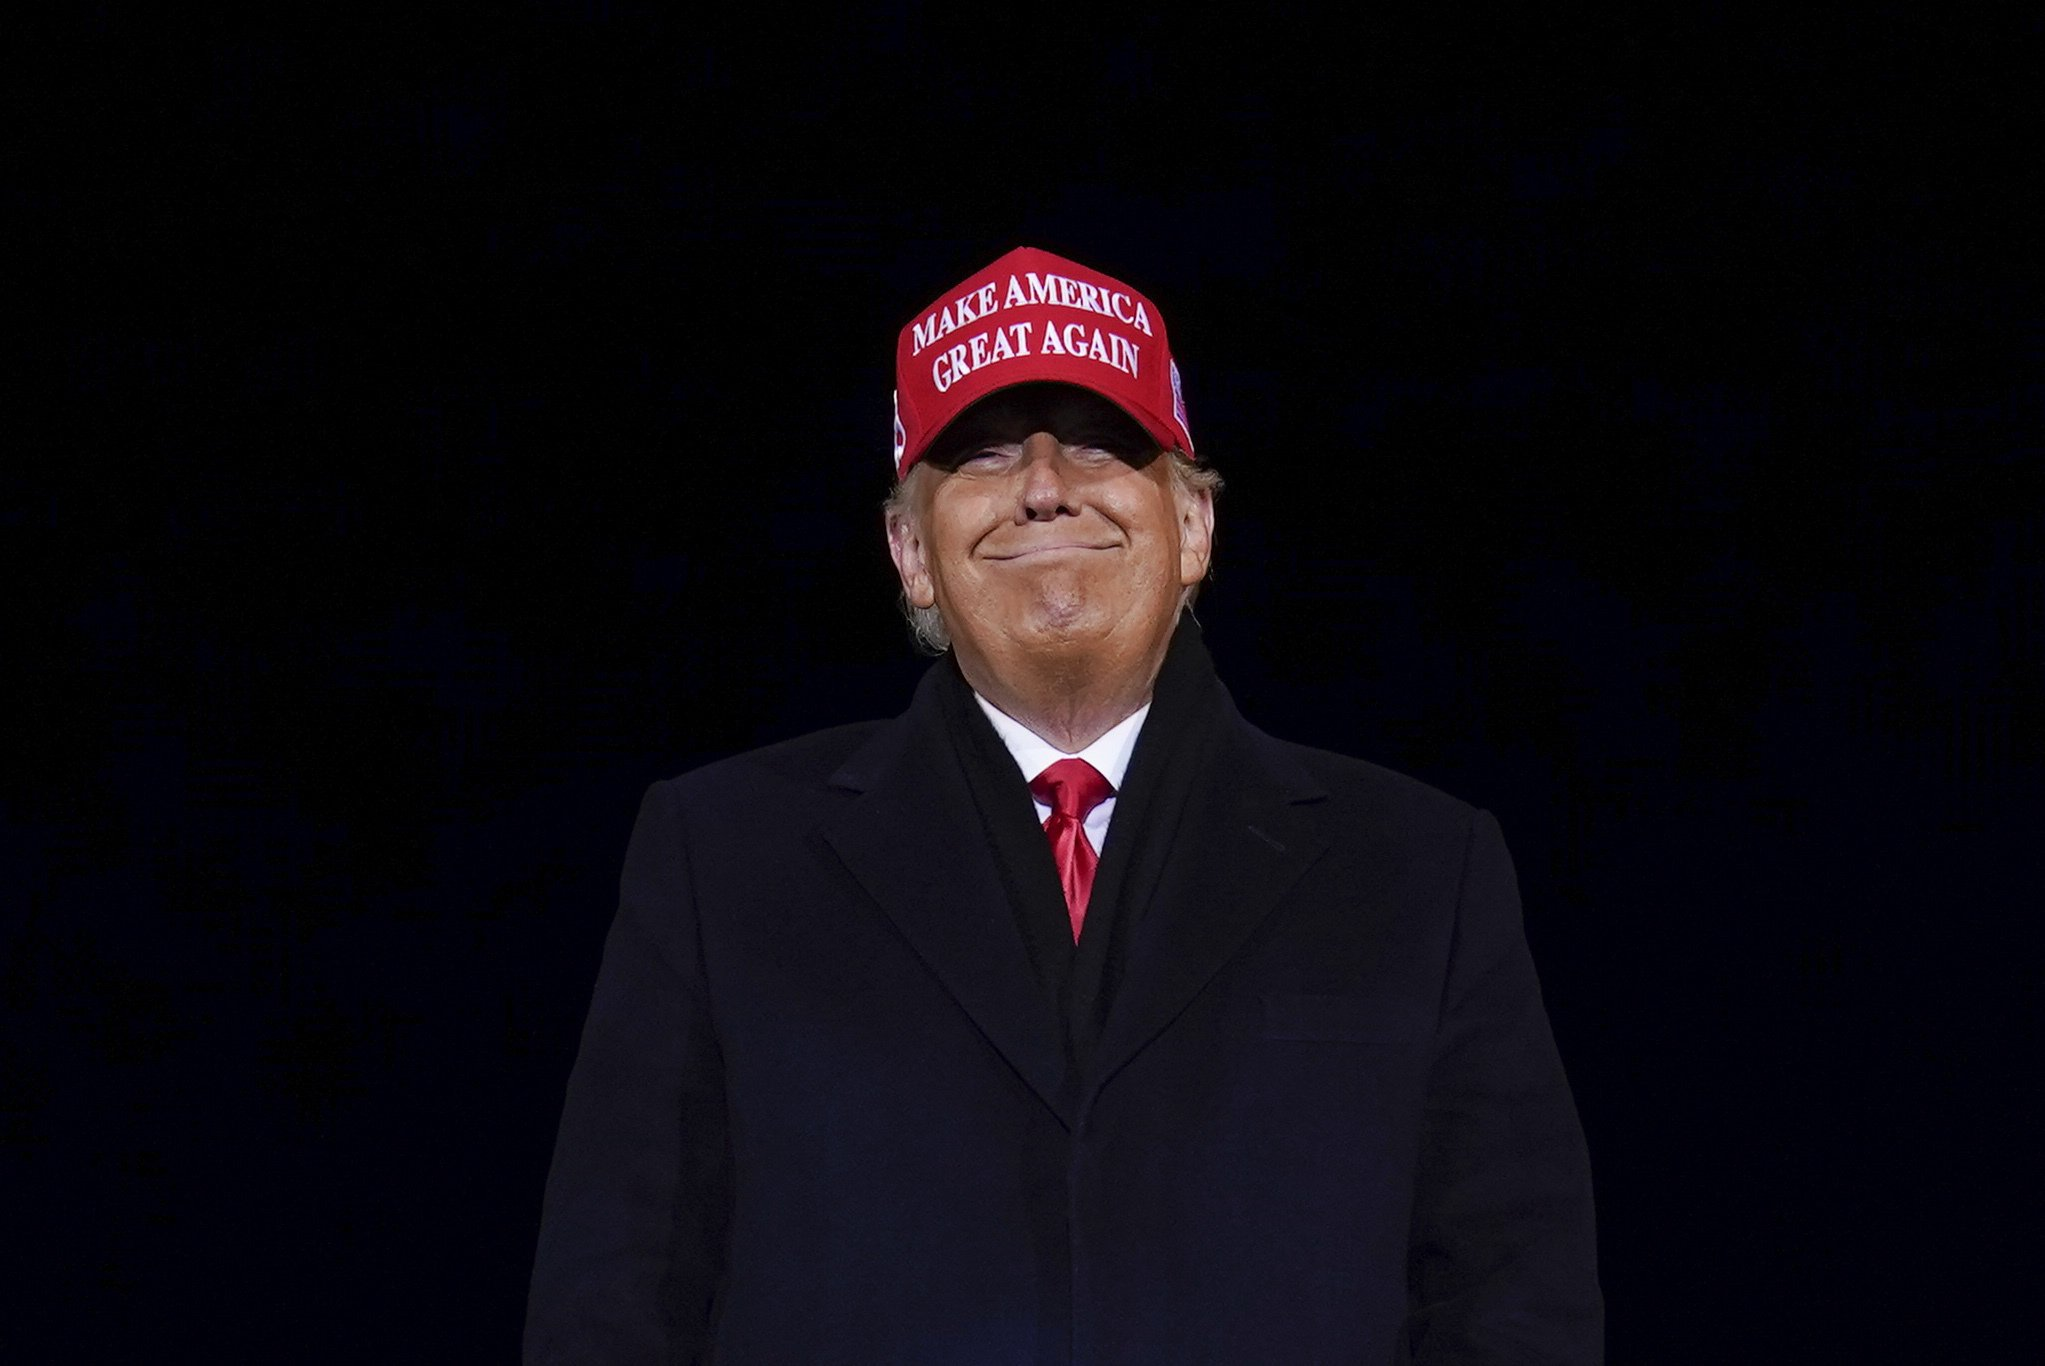 Trump-11.4.20-2.jpeg